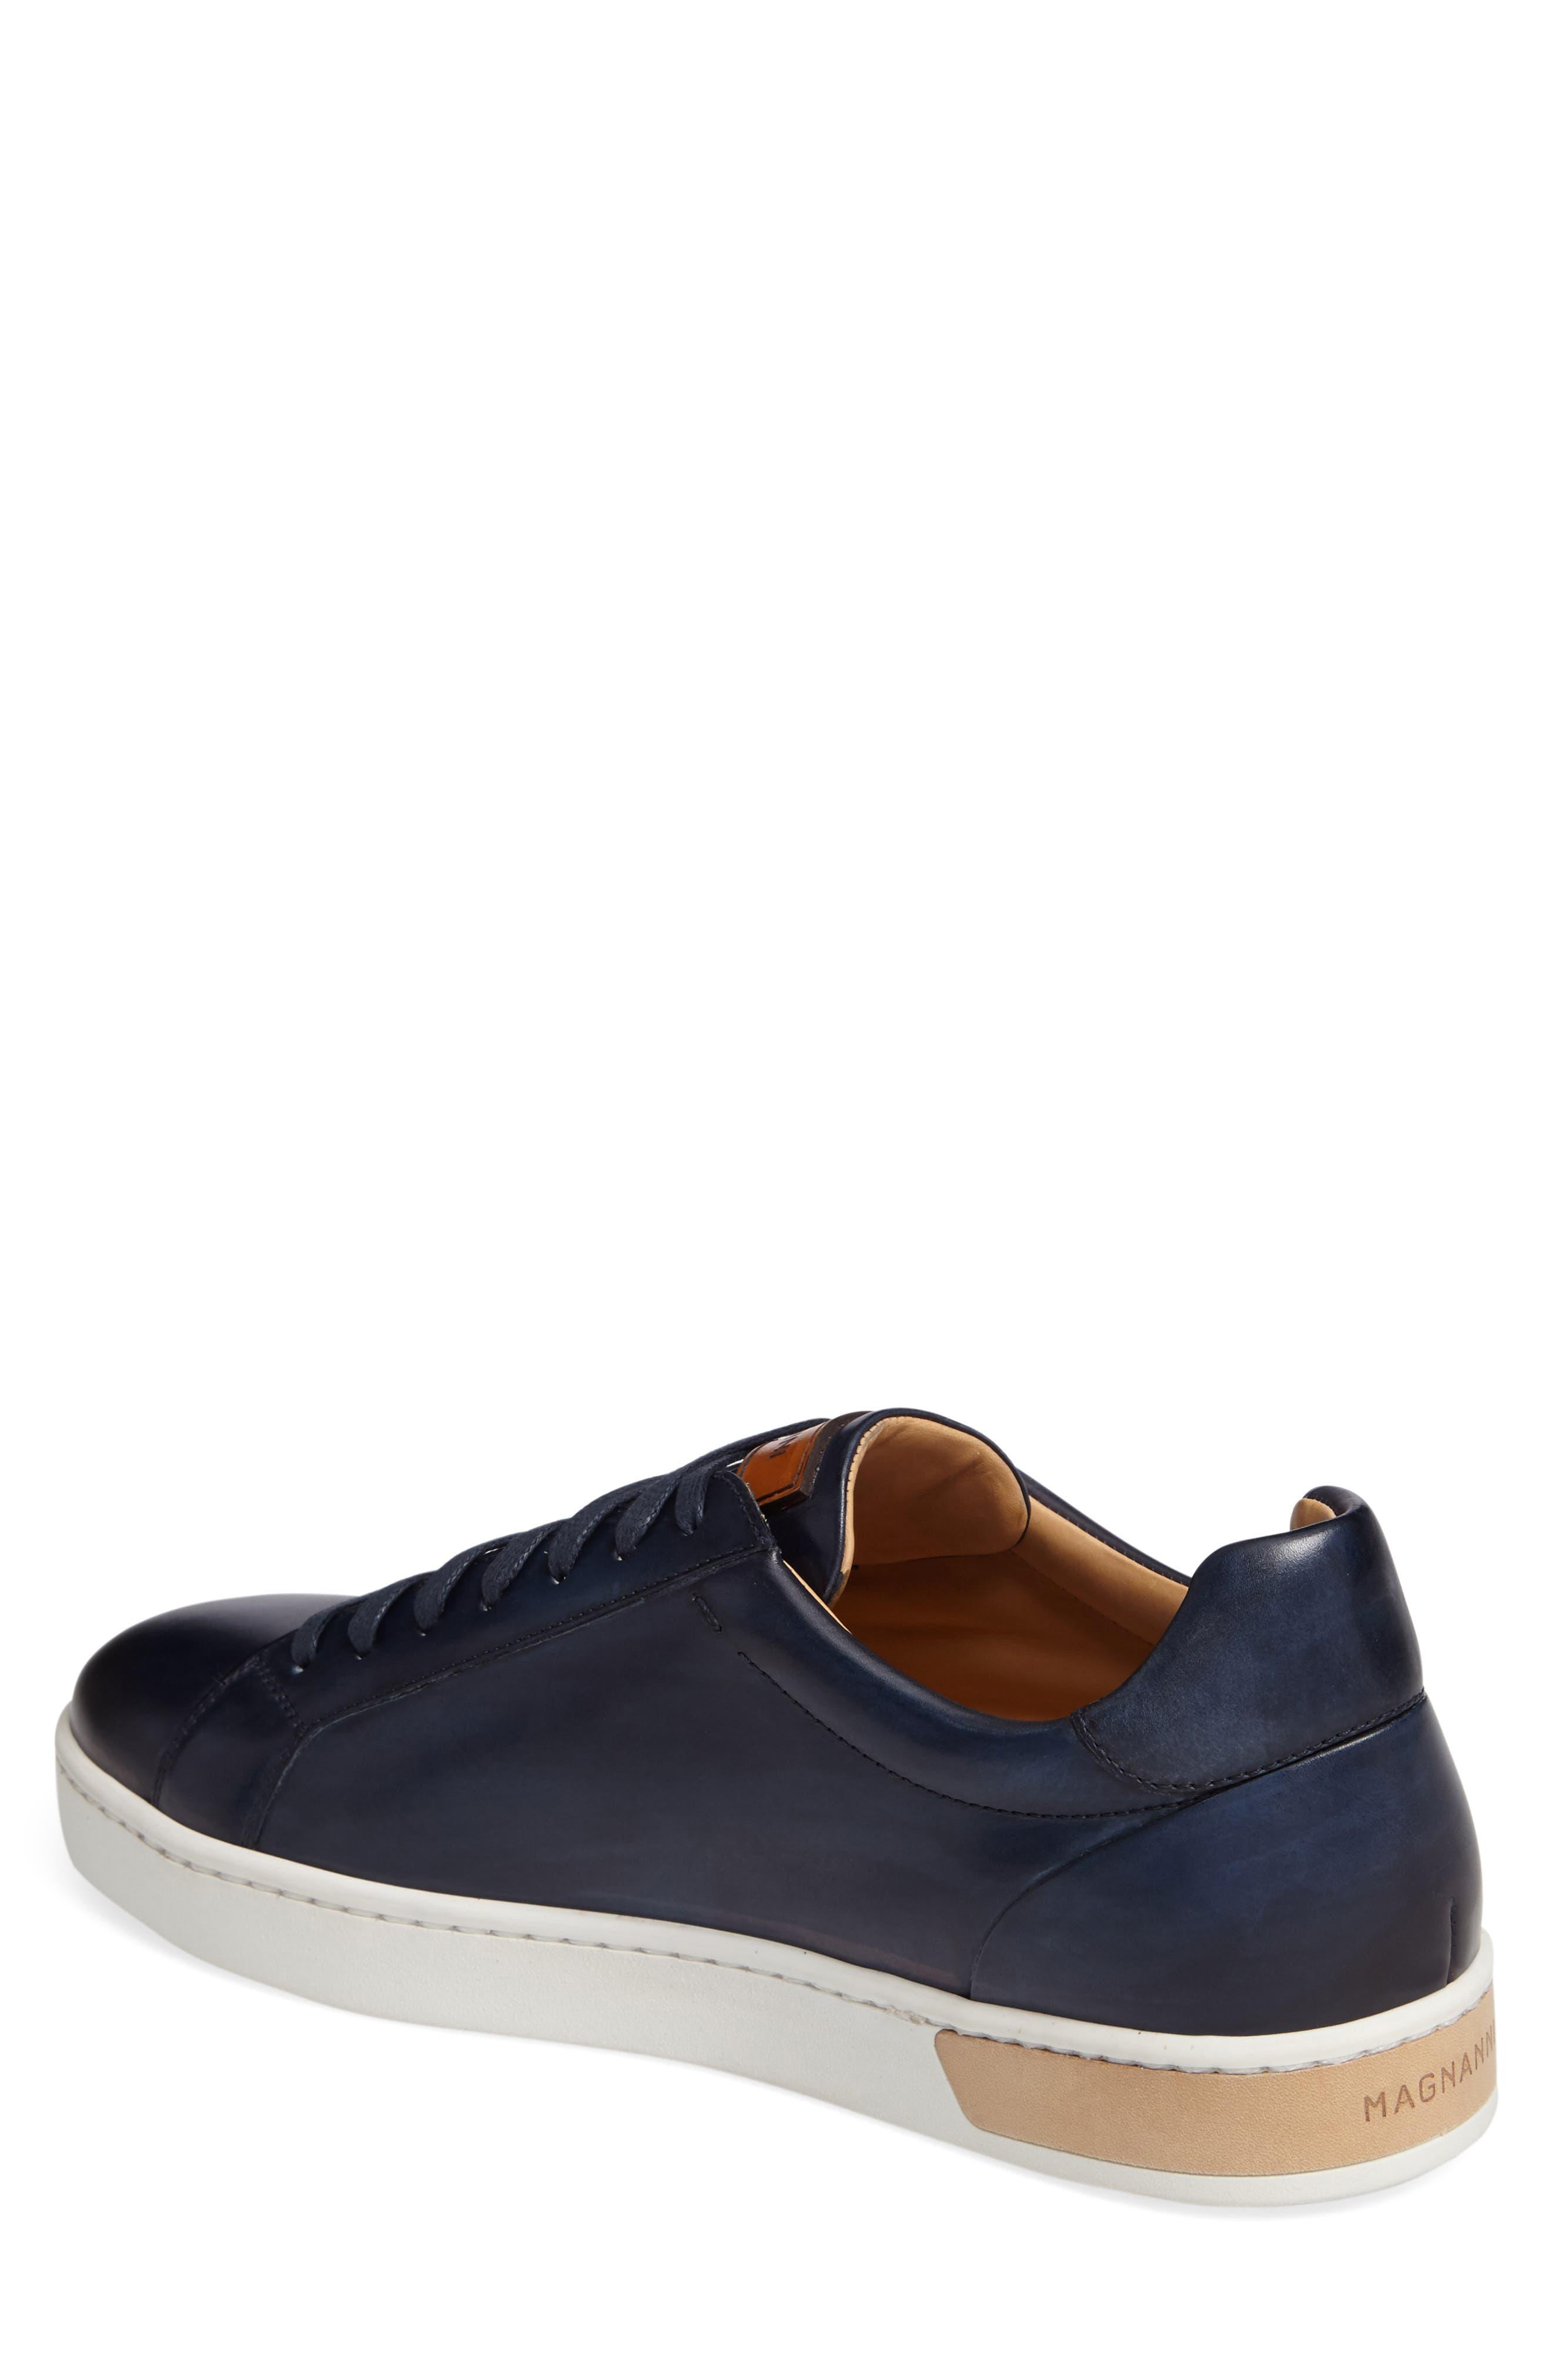 Alternate Image 2  - Magnanni Caballero Sneaker (Men)